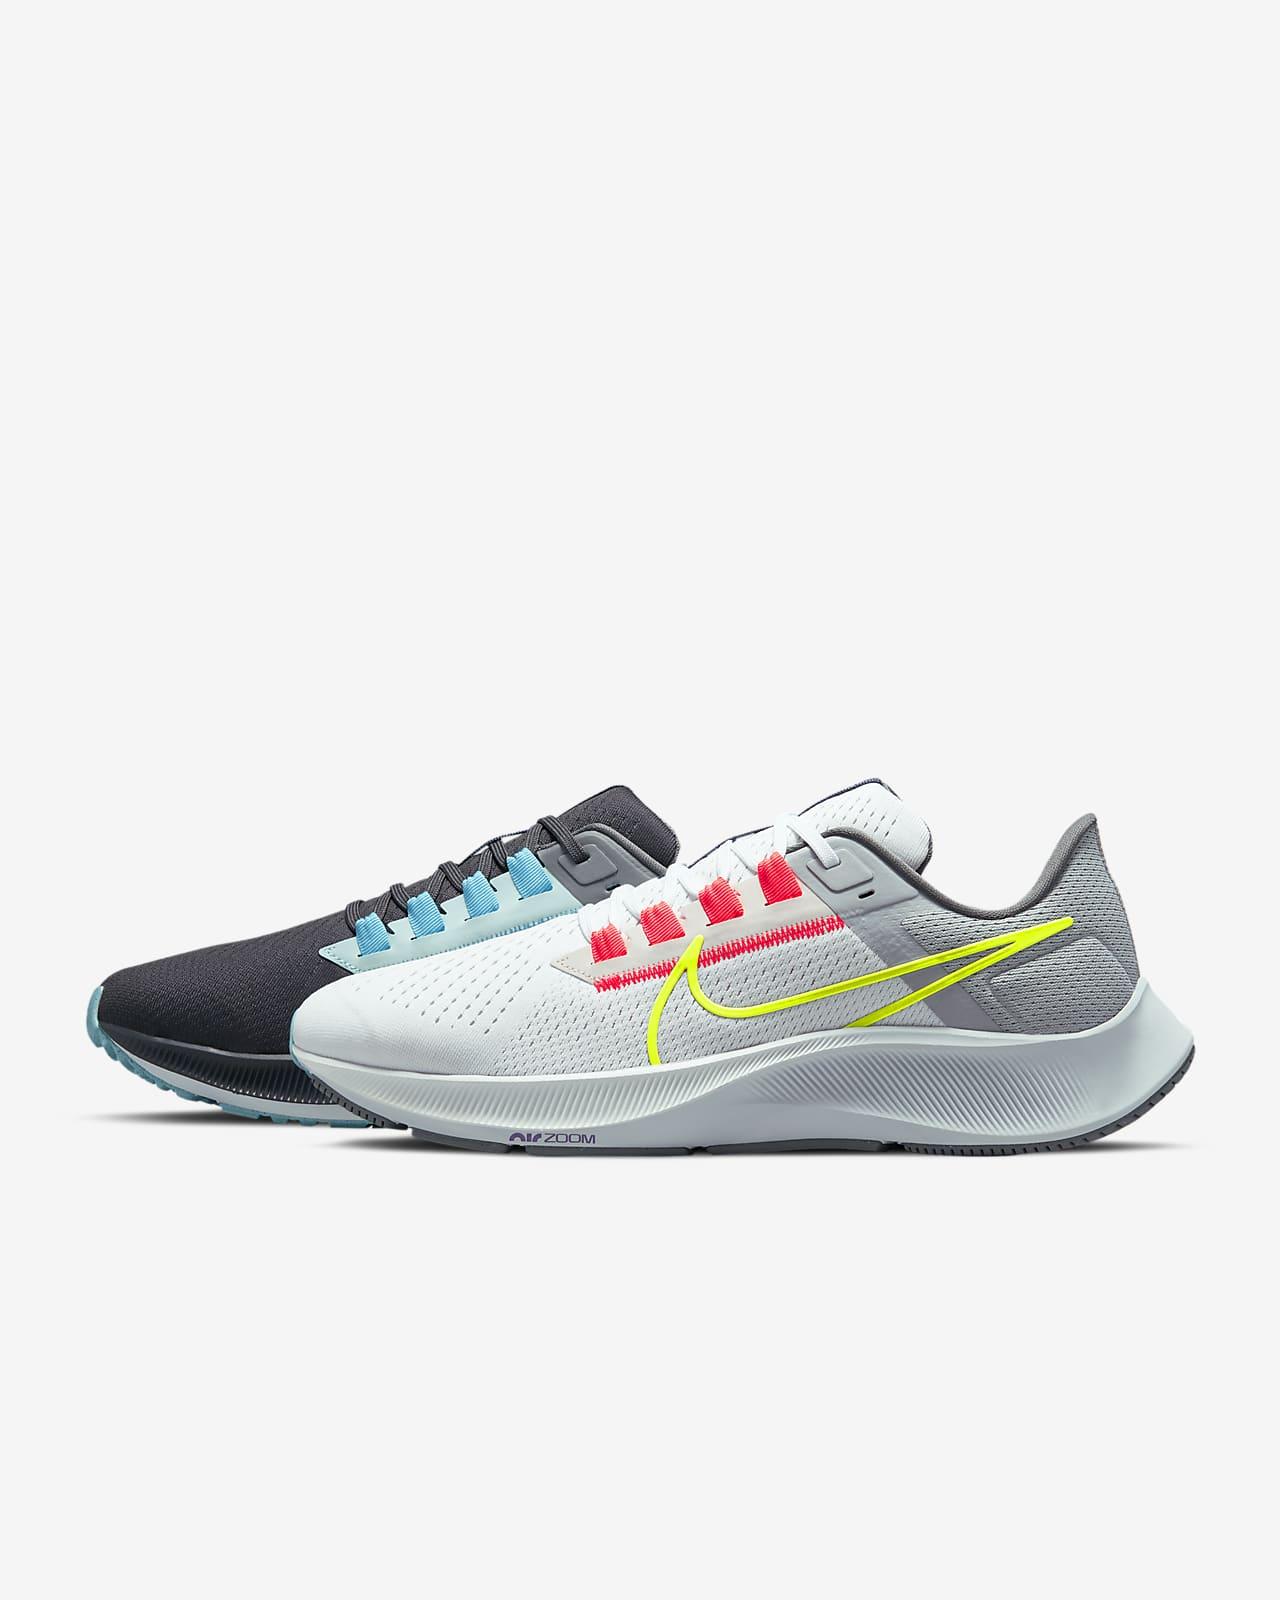 Calzado de running para hombre Nike Air Zoom Pegasus 38 Limited Edition